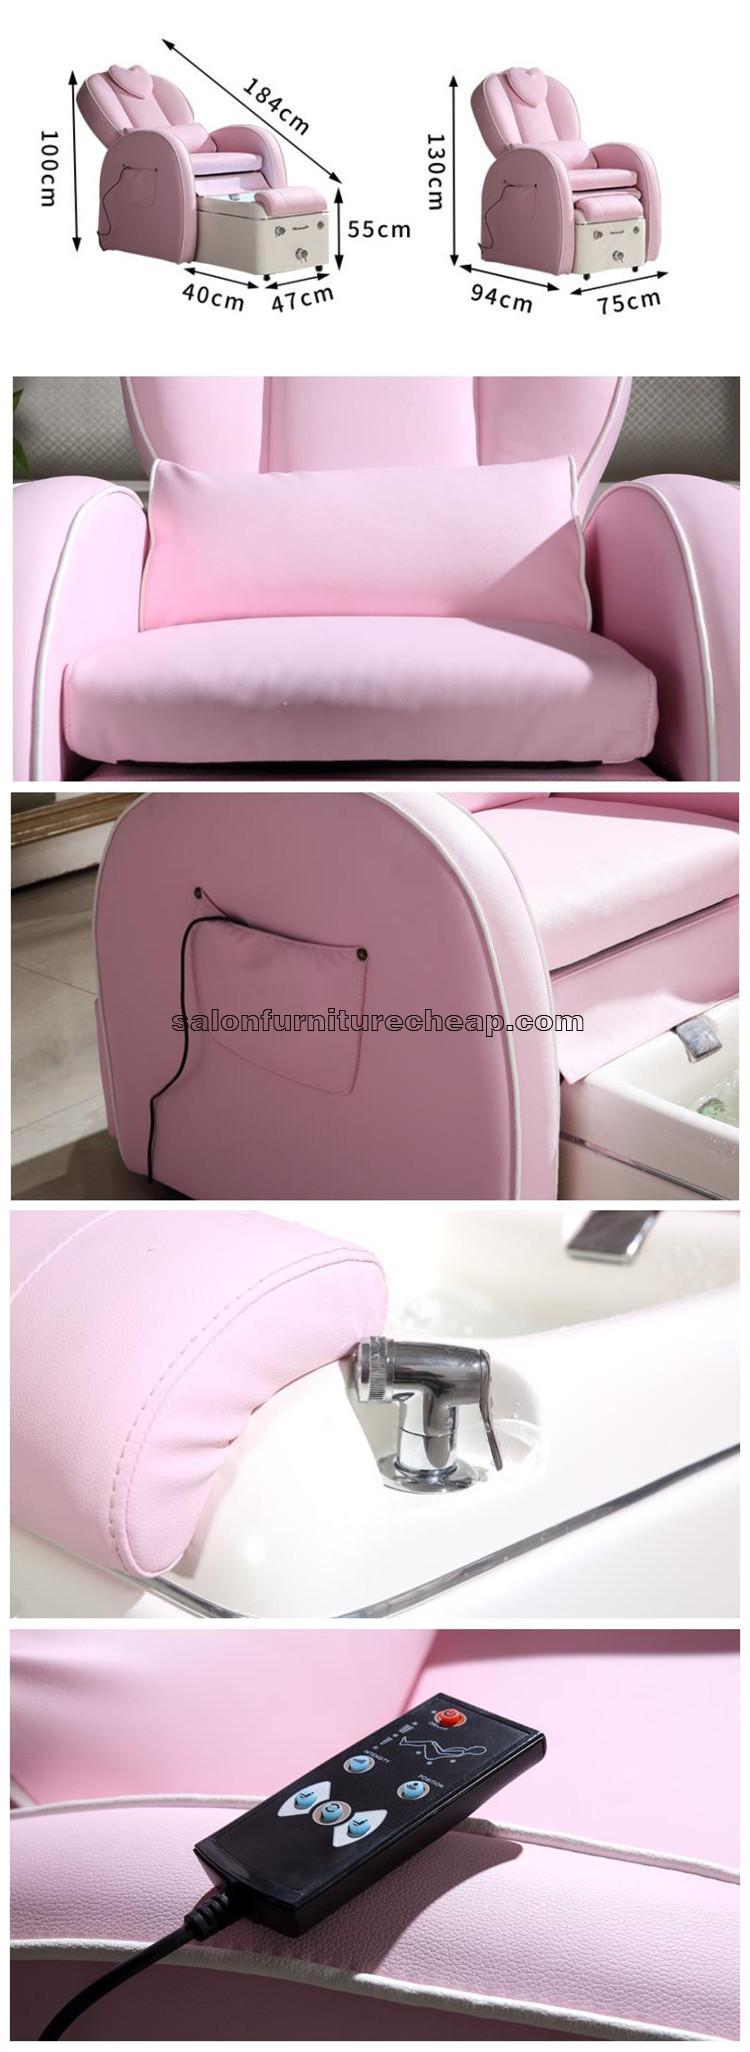 Spa Pedicure Chair Manufacturers Spa Massage Chair